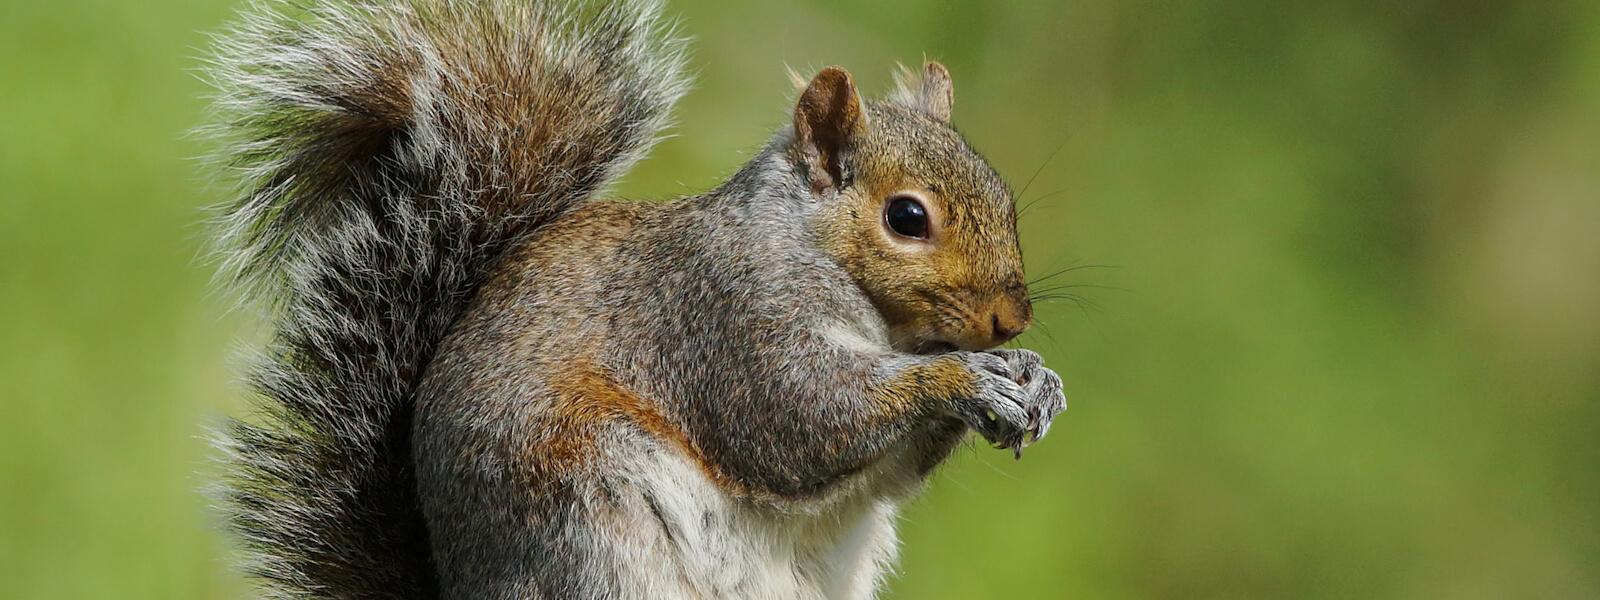 Squirrel sat on a tree stump